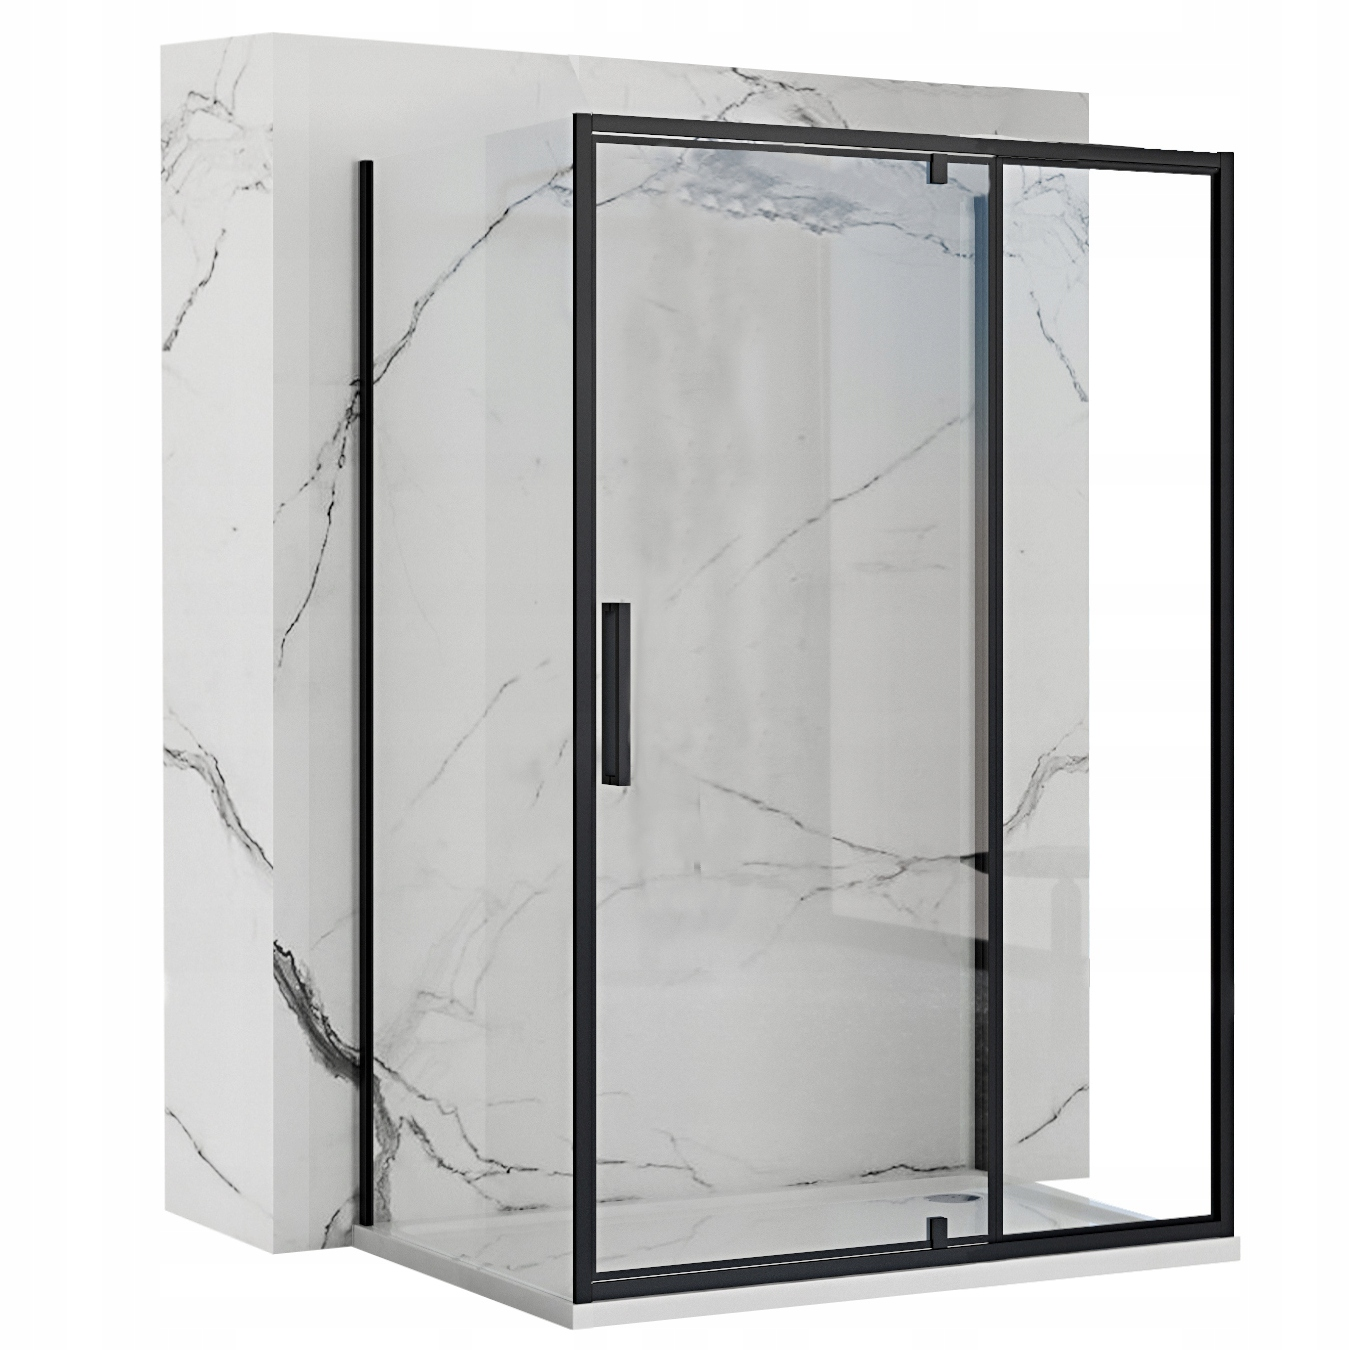 Čierna nástenná skrinka Rapid Swing 90x140 cm